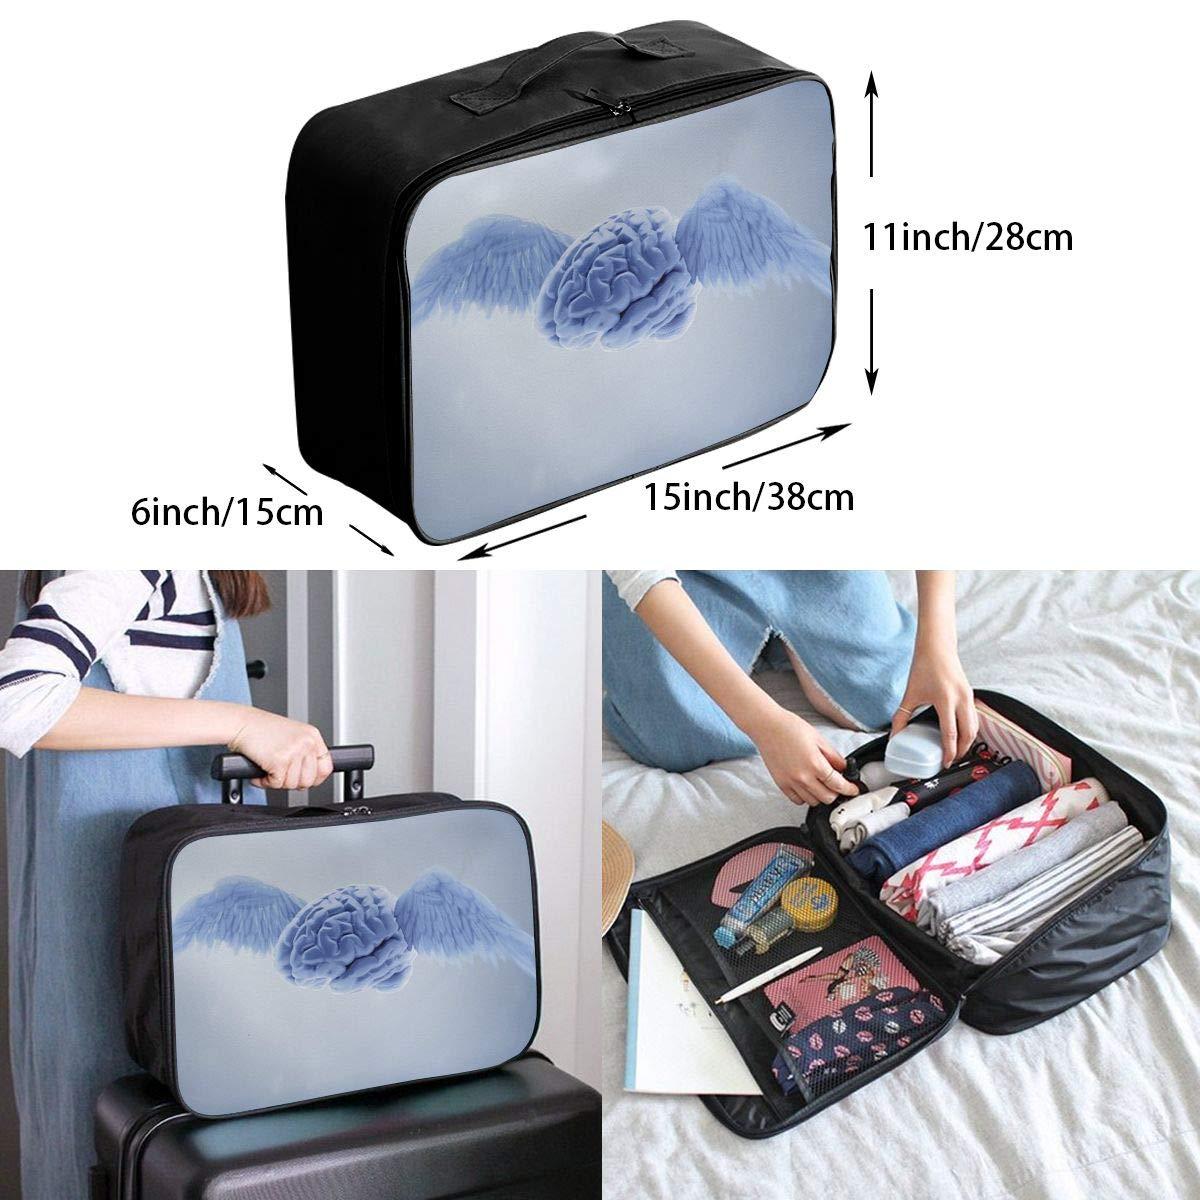 Travel Luggage Duffle Bag Lightweight Portable Handbag Brain With Wings Large Capacity Waterproof Foldable Storage Tote